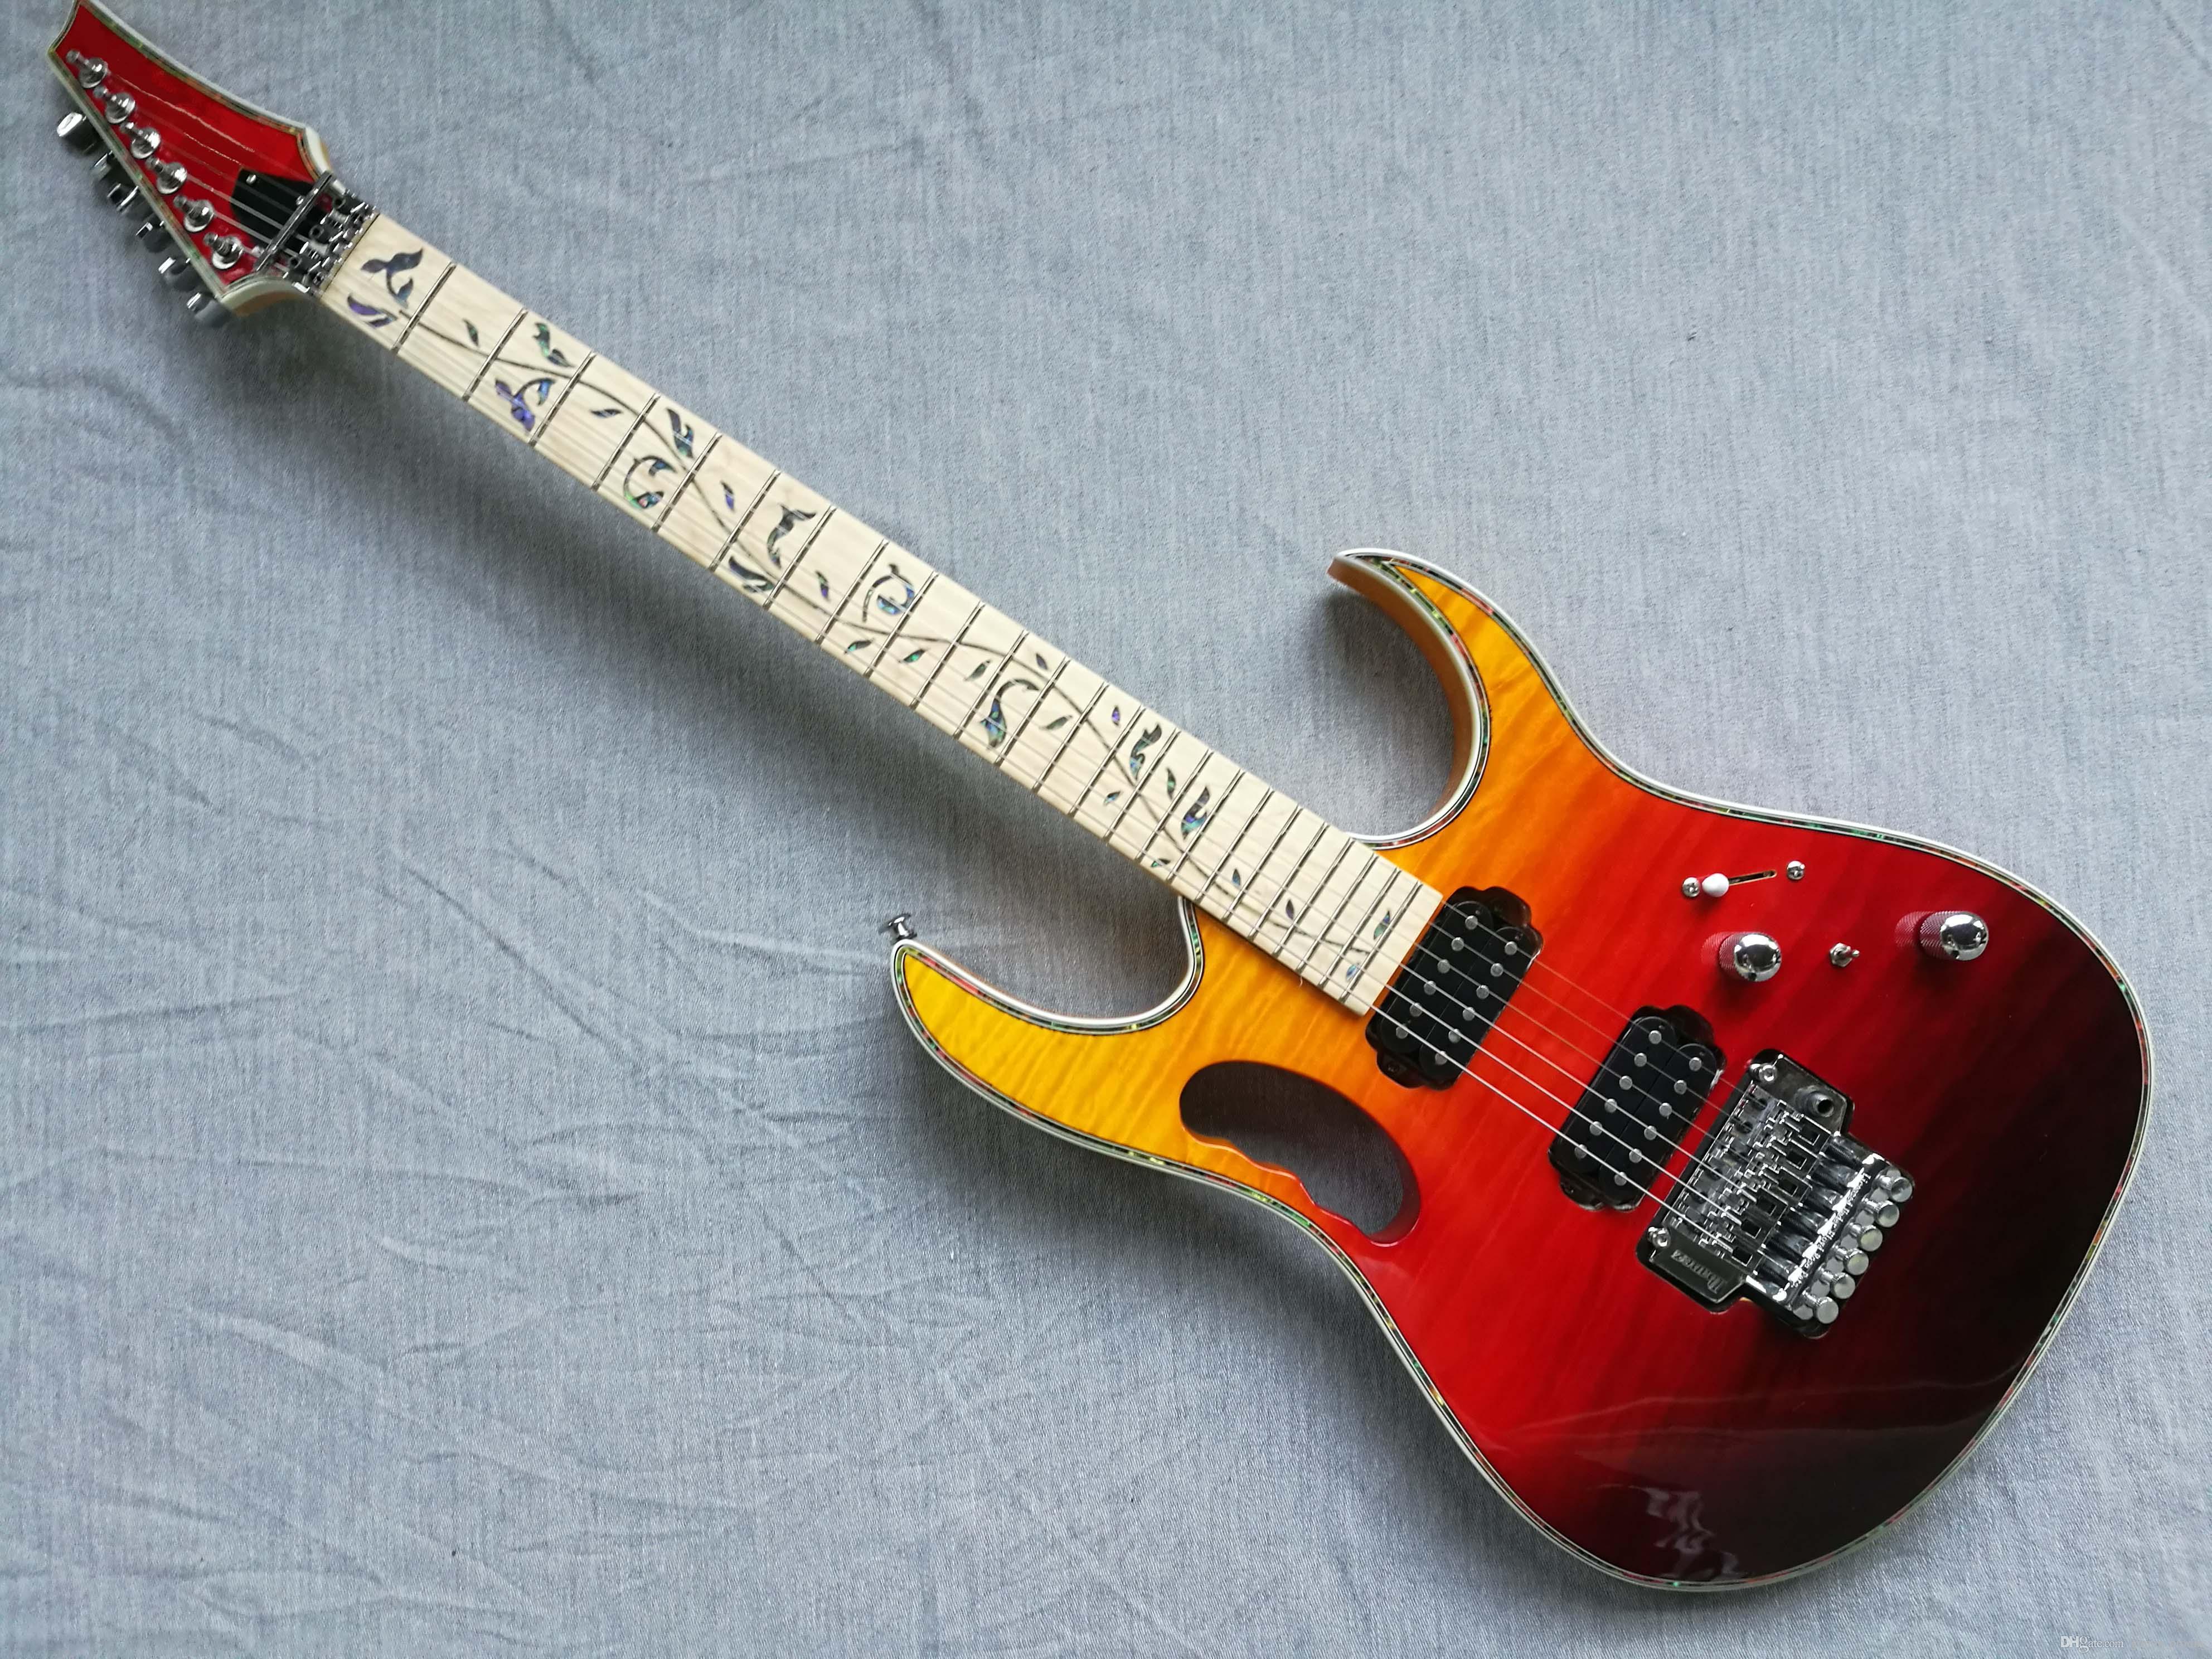 cheap guitar electric guitar r good hardware guitar manufacturers producing musical. Black Bedroom Furniture Sets. Home Design Ideas